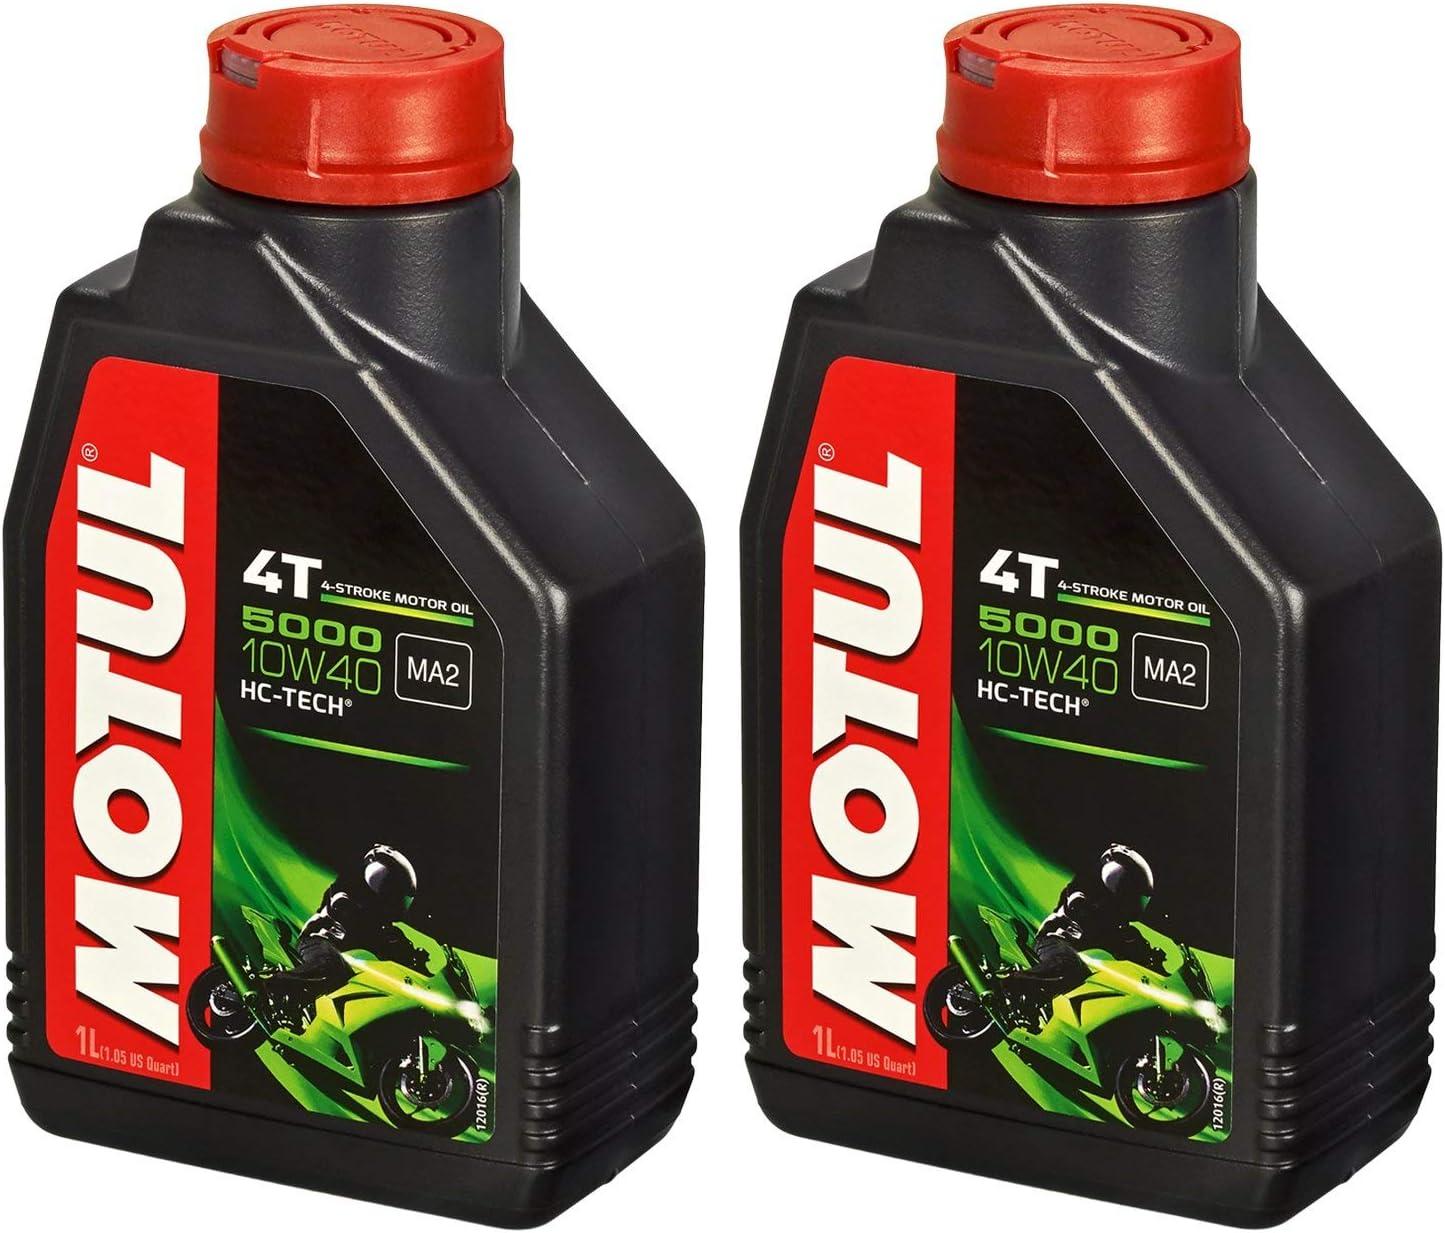 Motul 10w 40 Öl Mahle Ölfilter Für Kawasaki Klx 250 09 15 Lx250s Ölwechselset Inkl Motoröl Filter Dichtring Auto